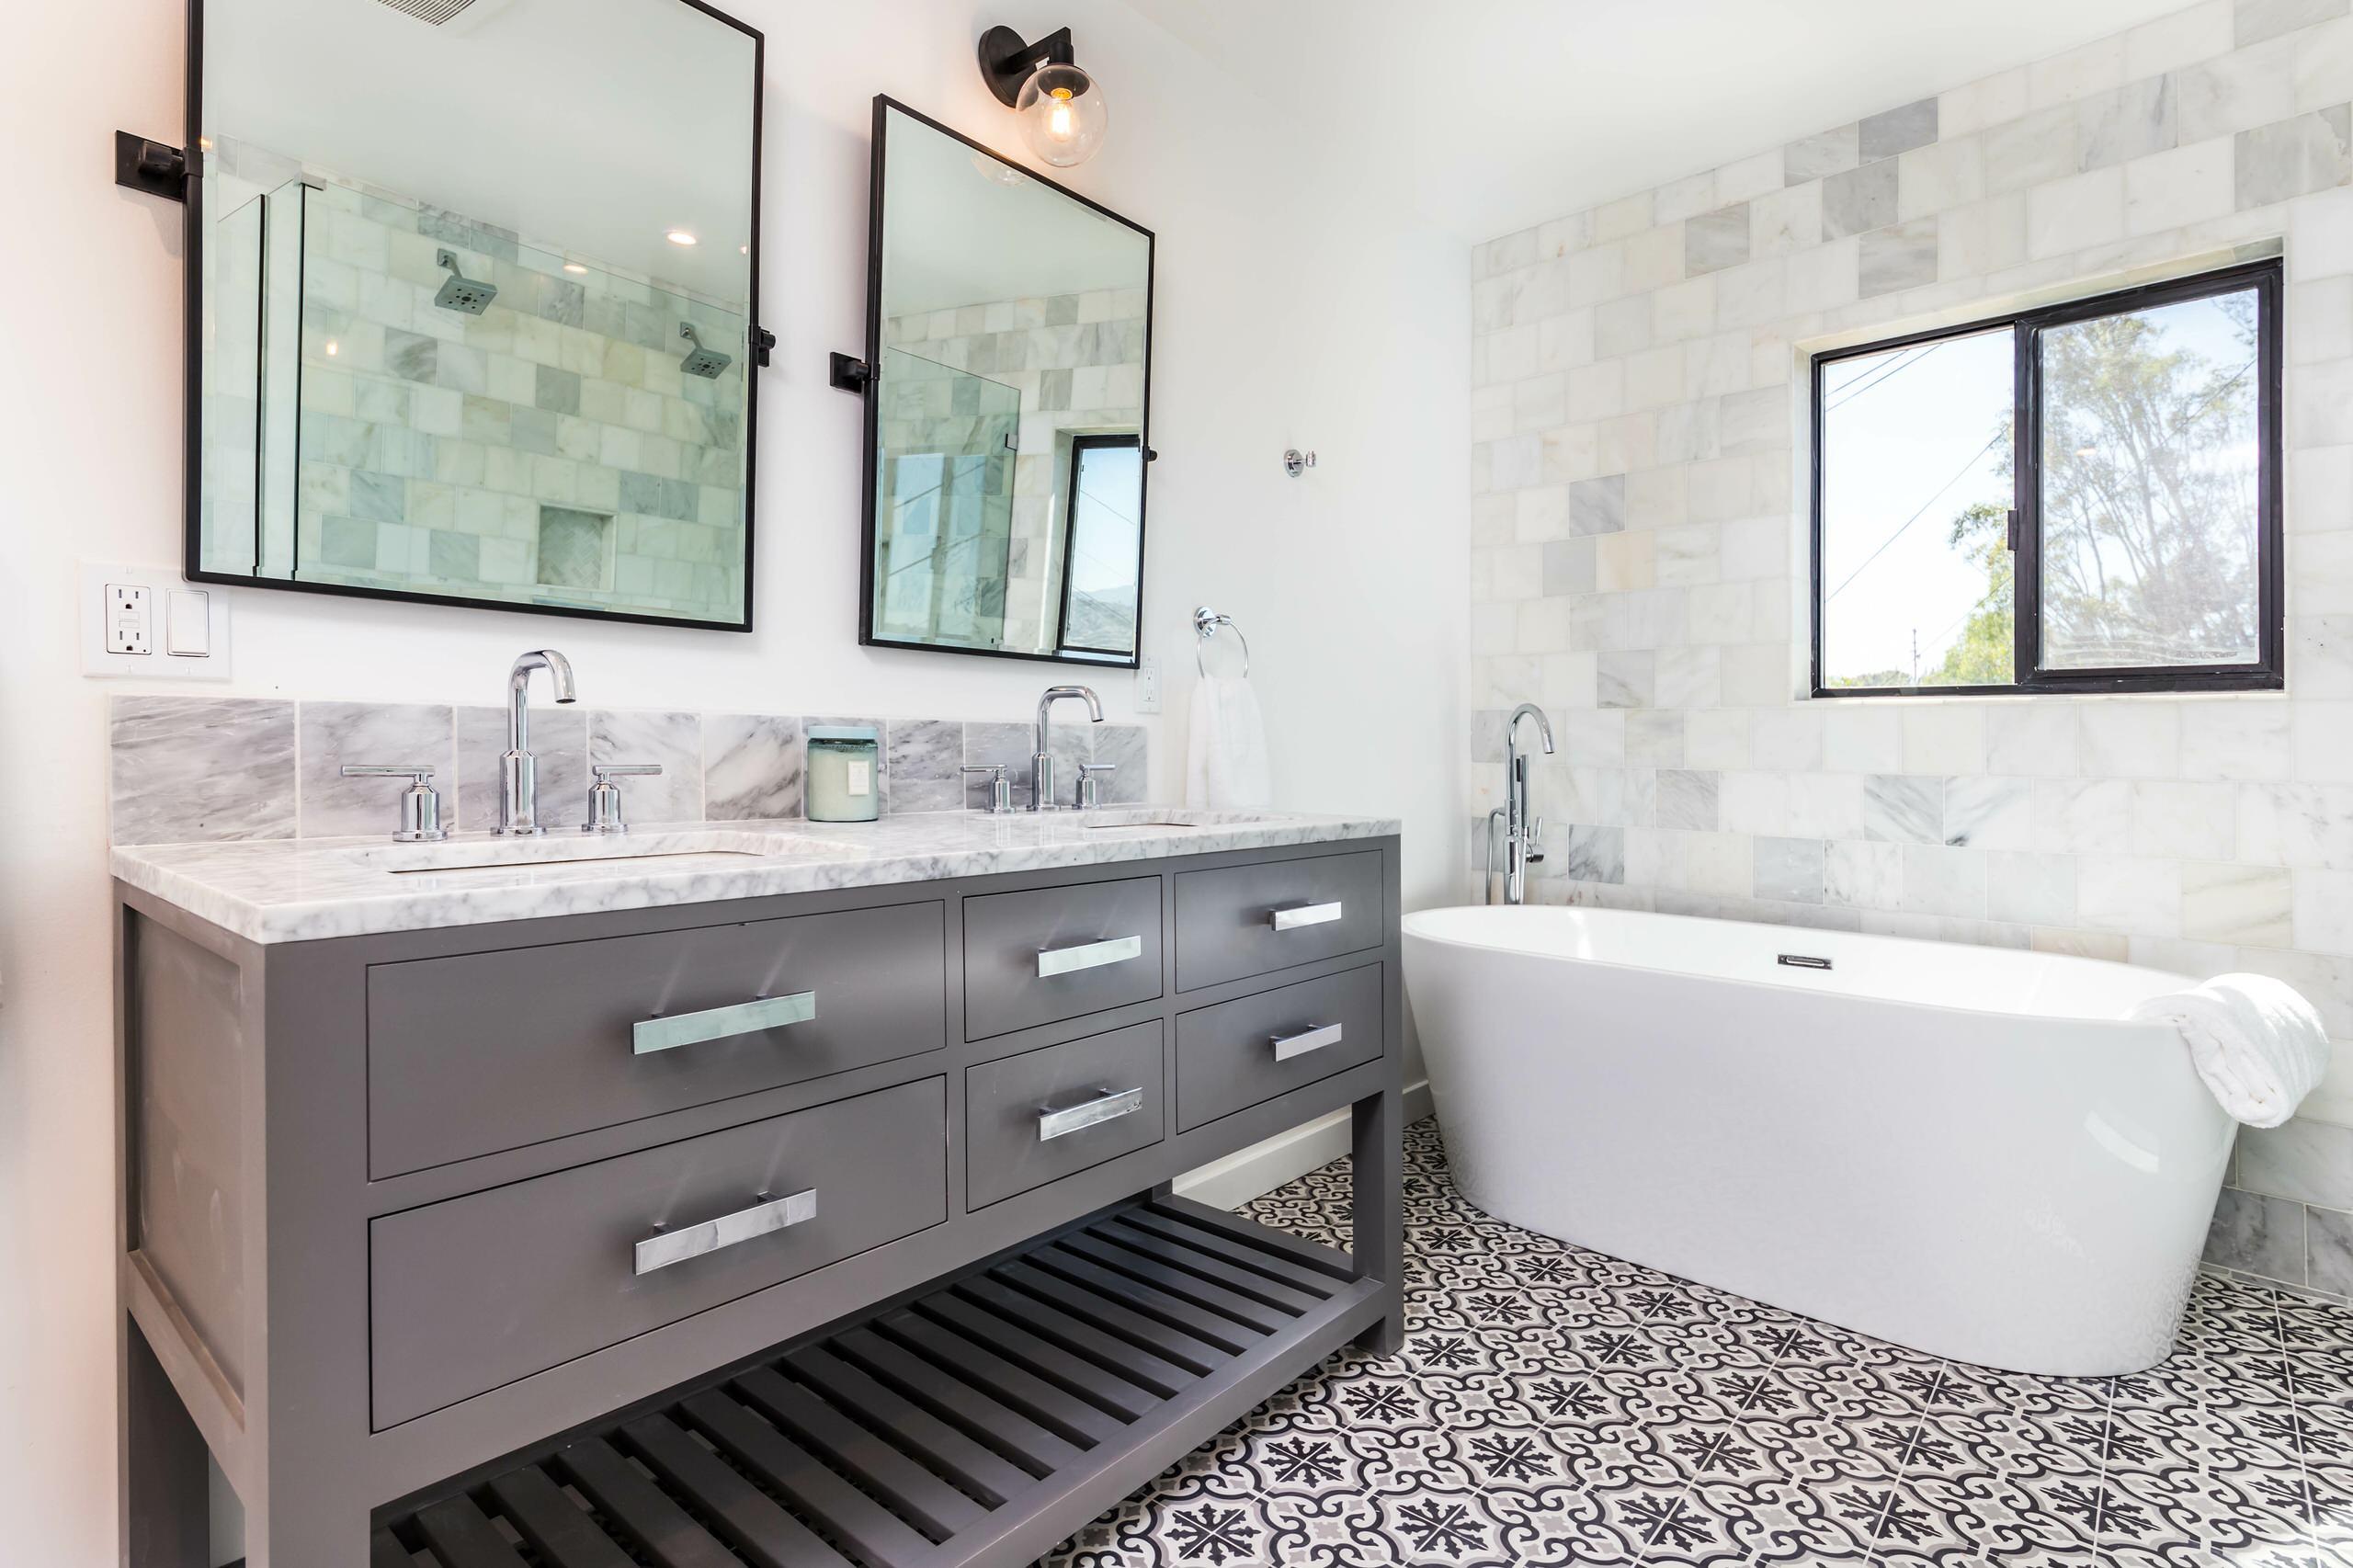 Patterned tile Compact Bathroom